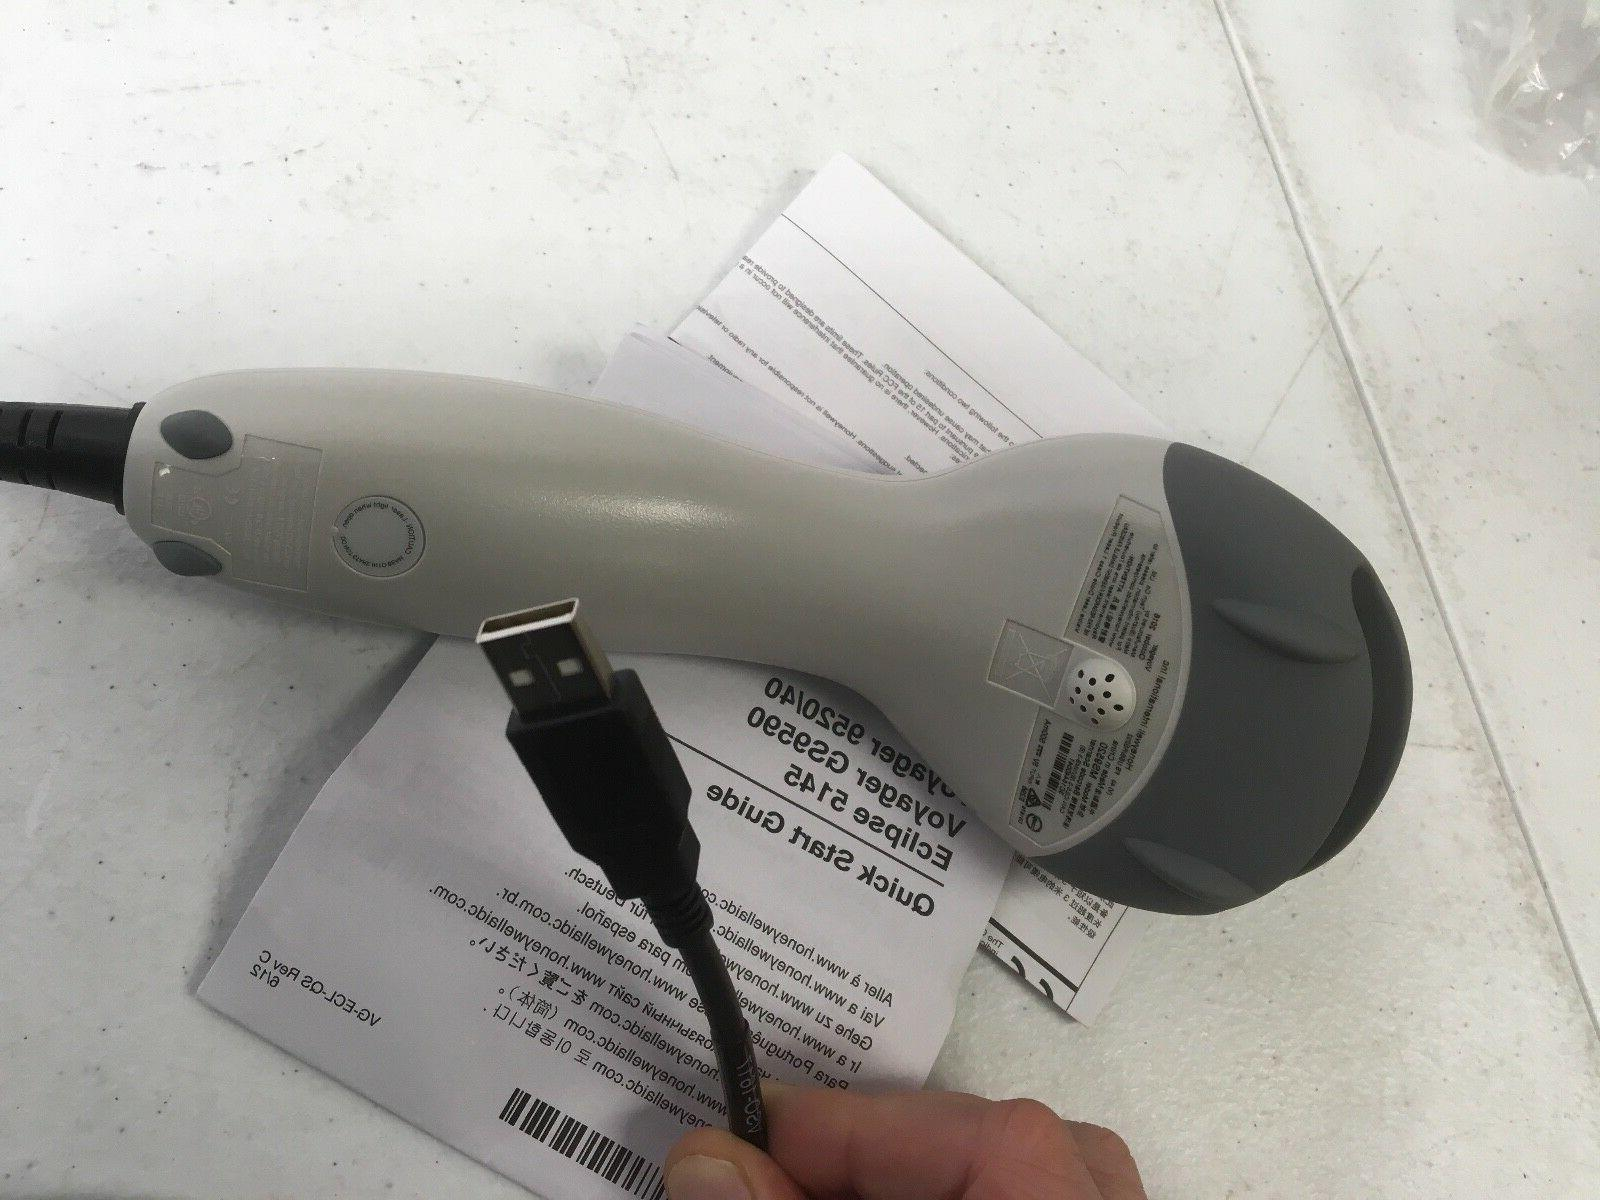 ✮✅ Honeywell USB Barcode Scanner Eclipse 5145 WTY✮✅